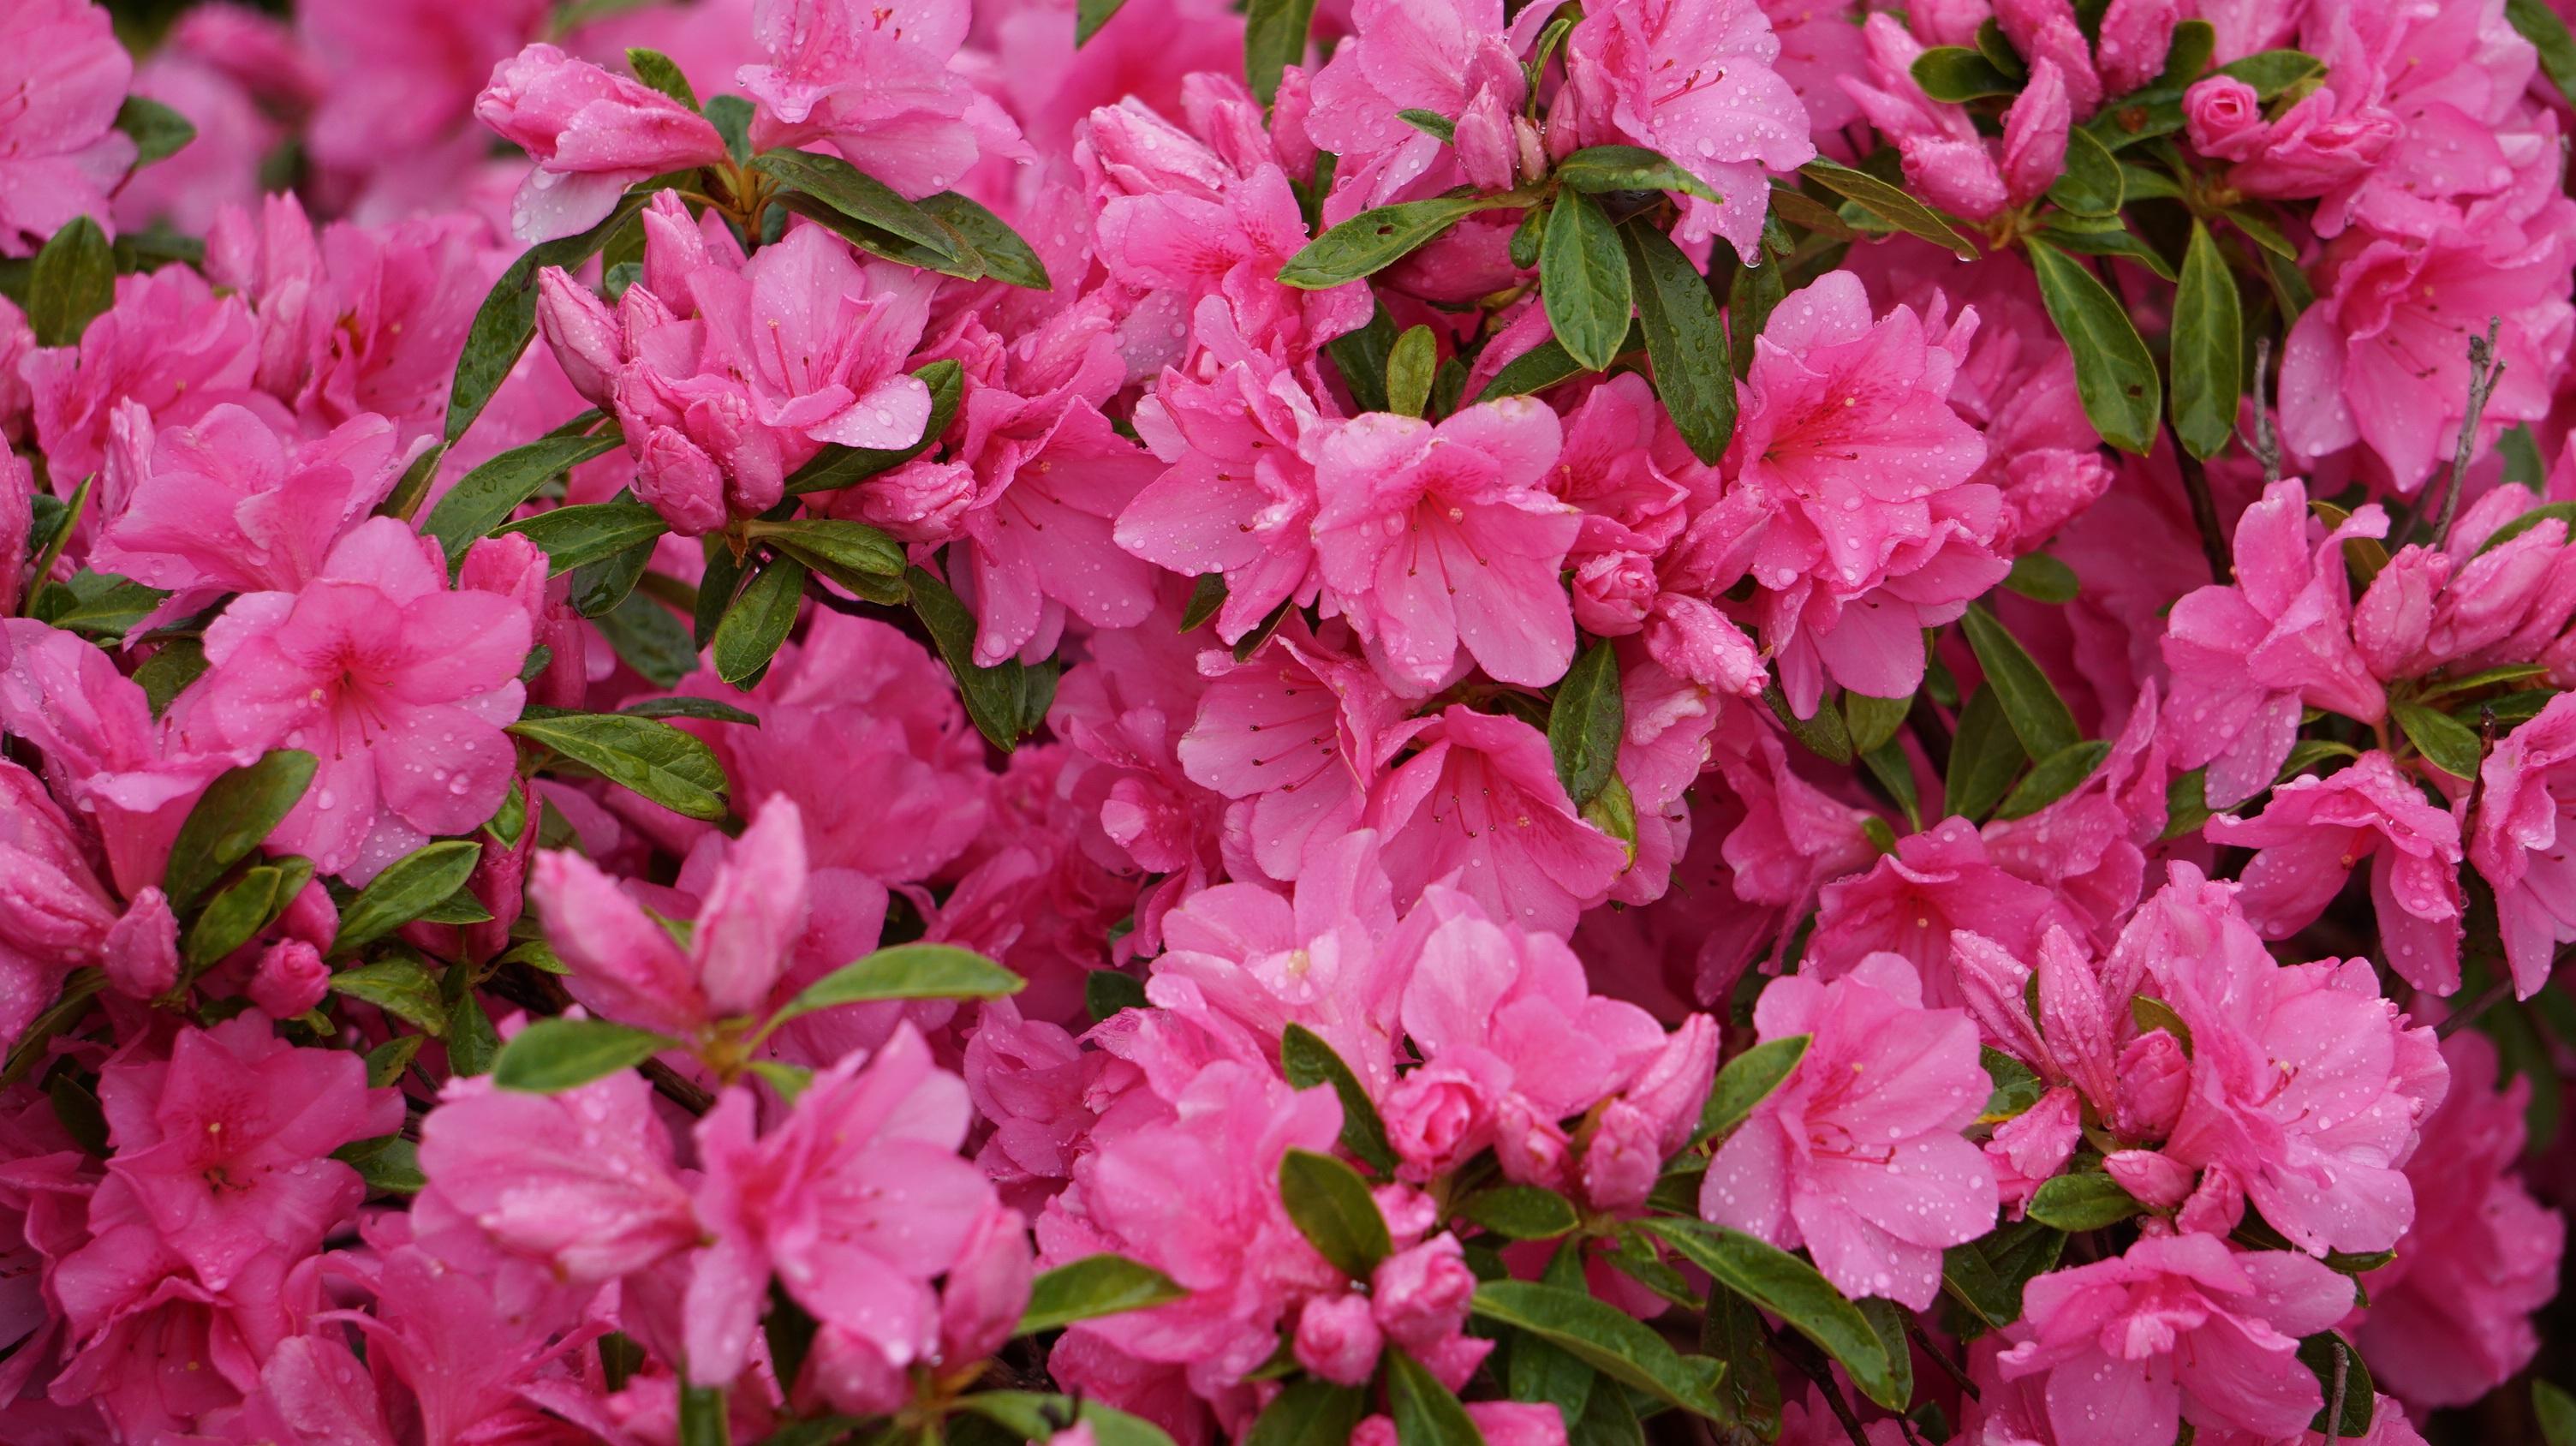 Free Images Nature Petal Bouquet Flora Shrub Rhododendron